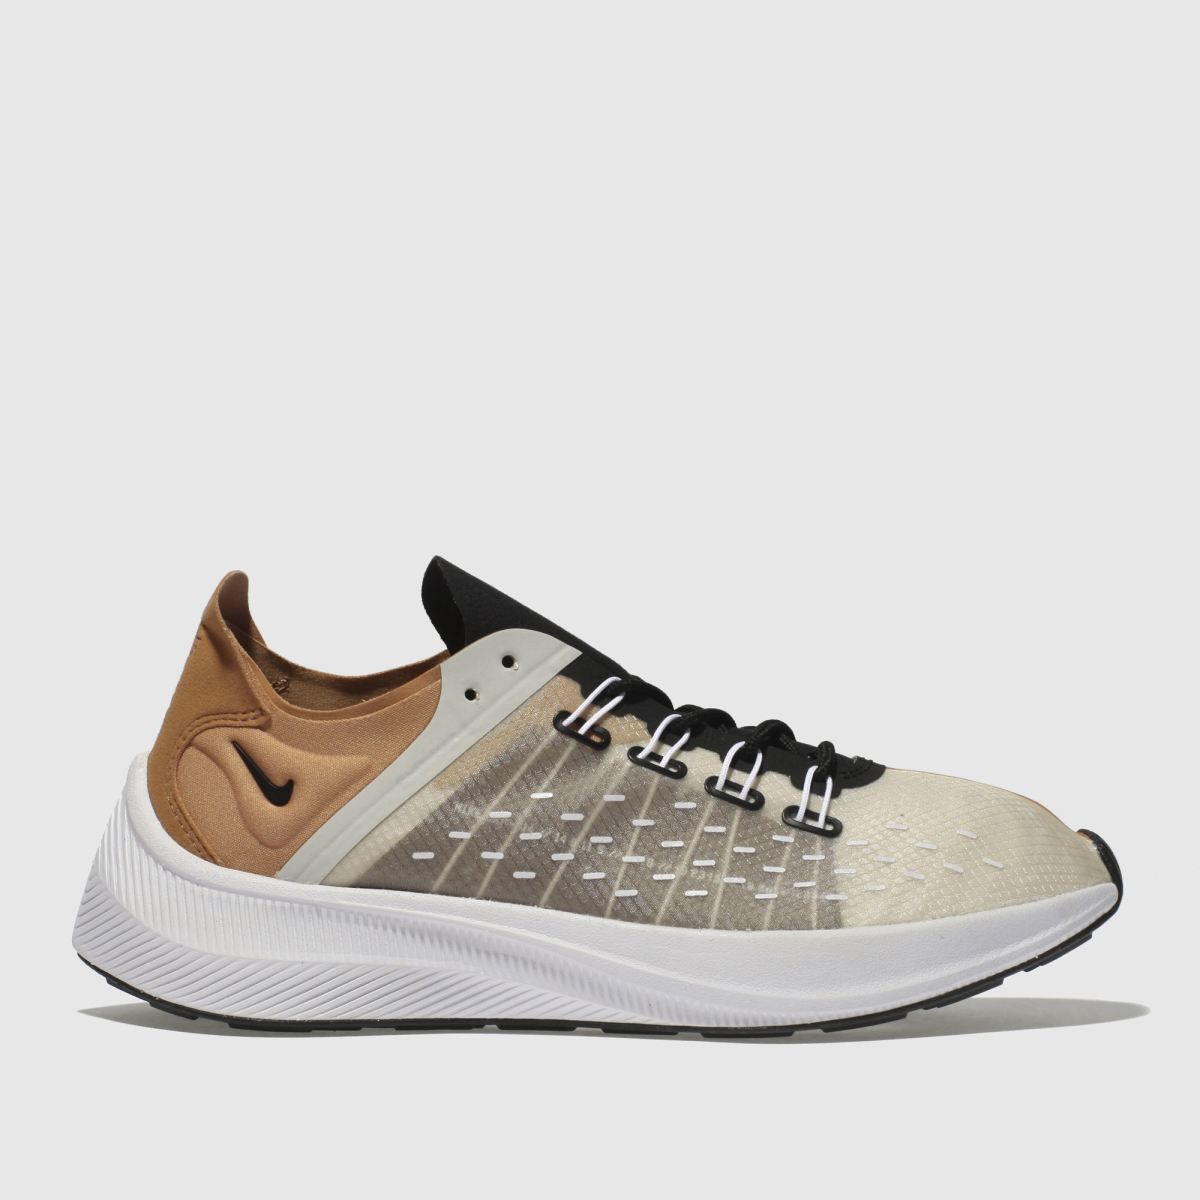 Nike Peach Exp-14 Trainers